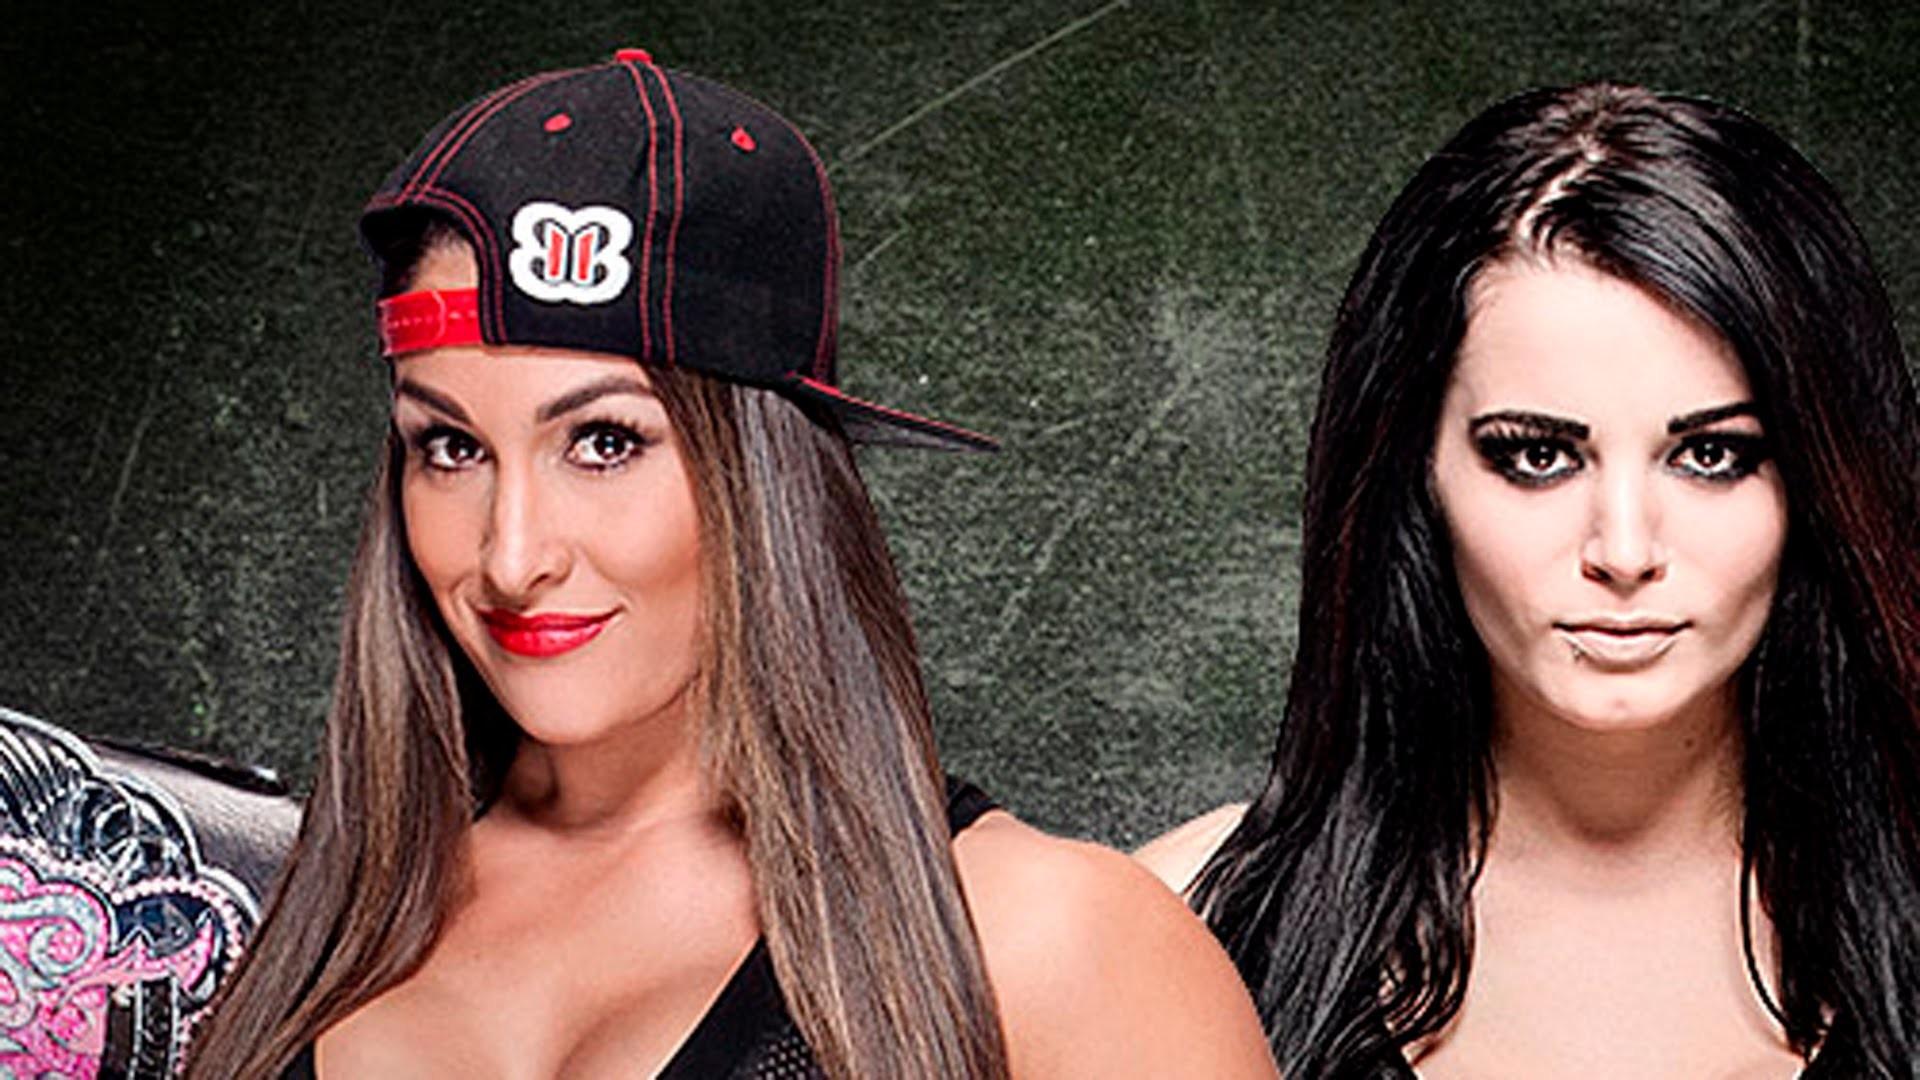 Paige vs. Nikki Bella – WWE Divas Championship – Money in the Bank WWE 2K15  Simulation – YouTube